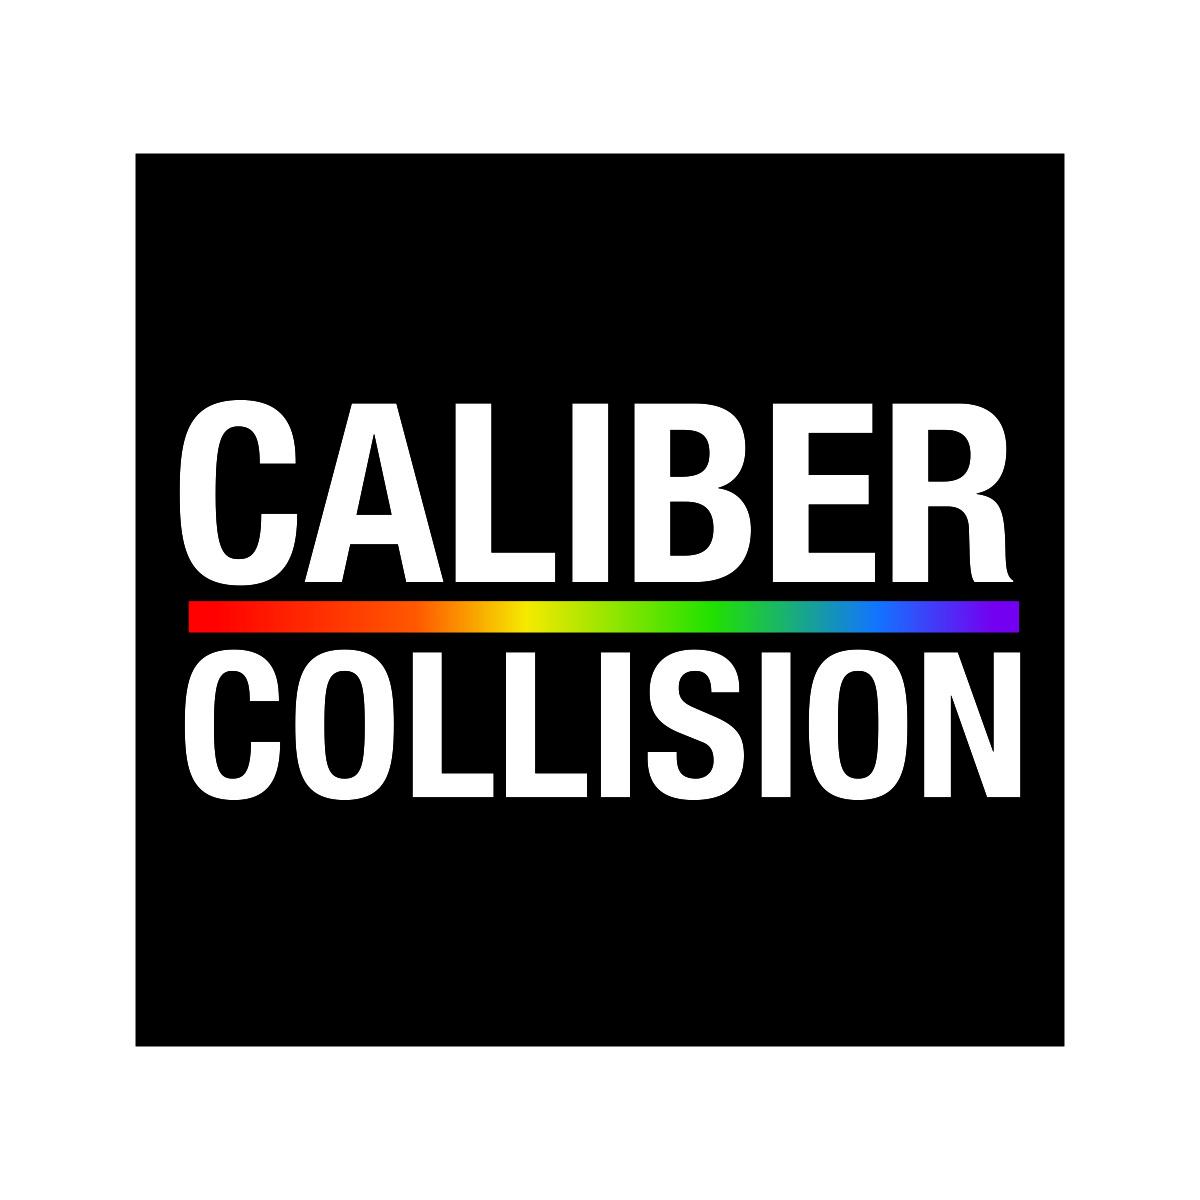 https://promotionplusinc.com/wp-content/uploads/2019/04/Calliber-Collision.jpg